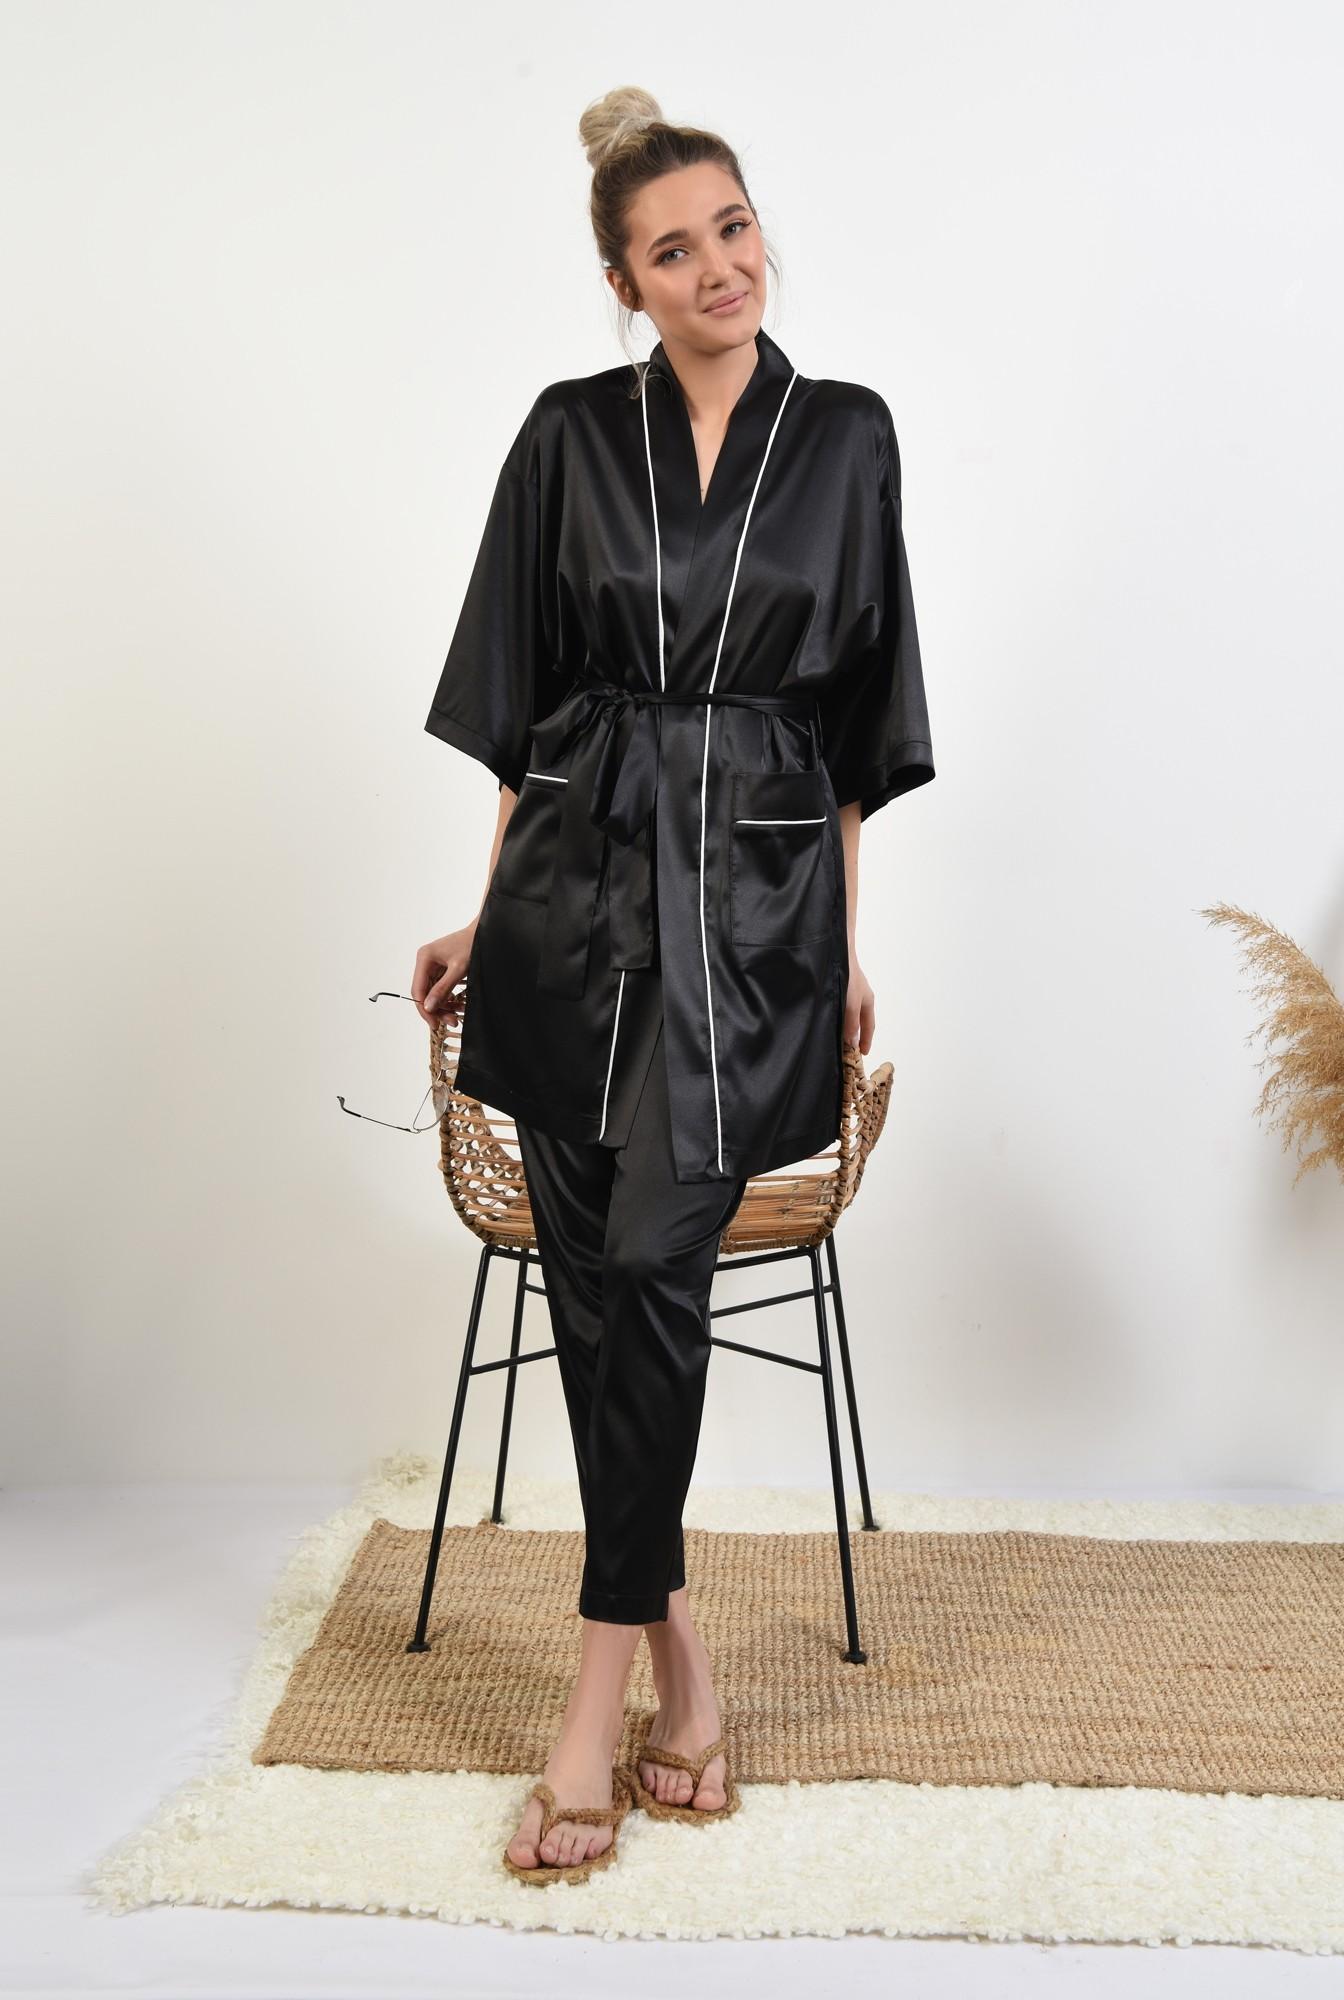 3 - 360 - pantaloni din satin, negri, lungi, cu funda in contrast